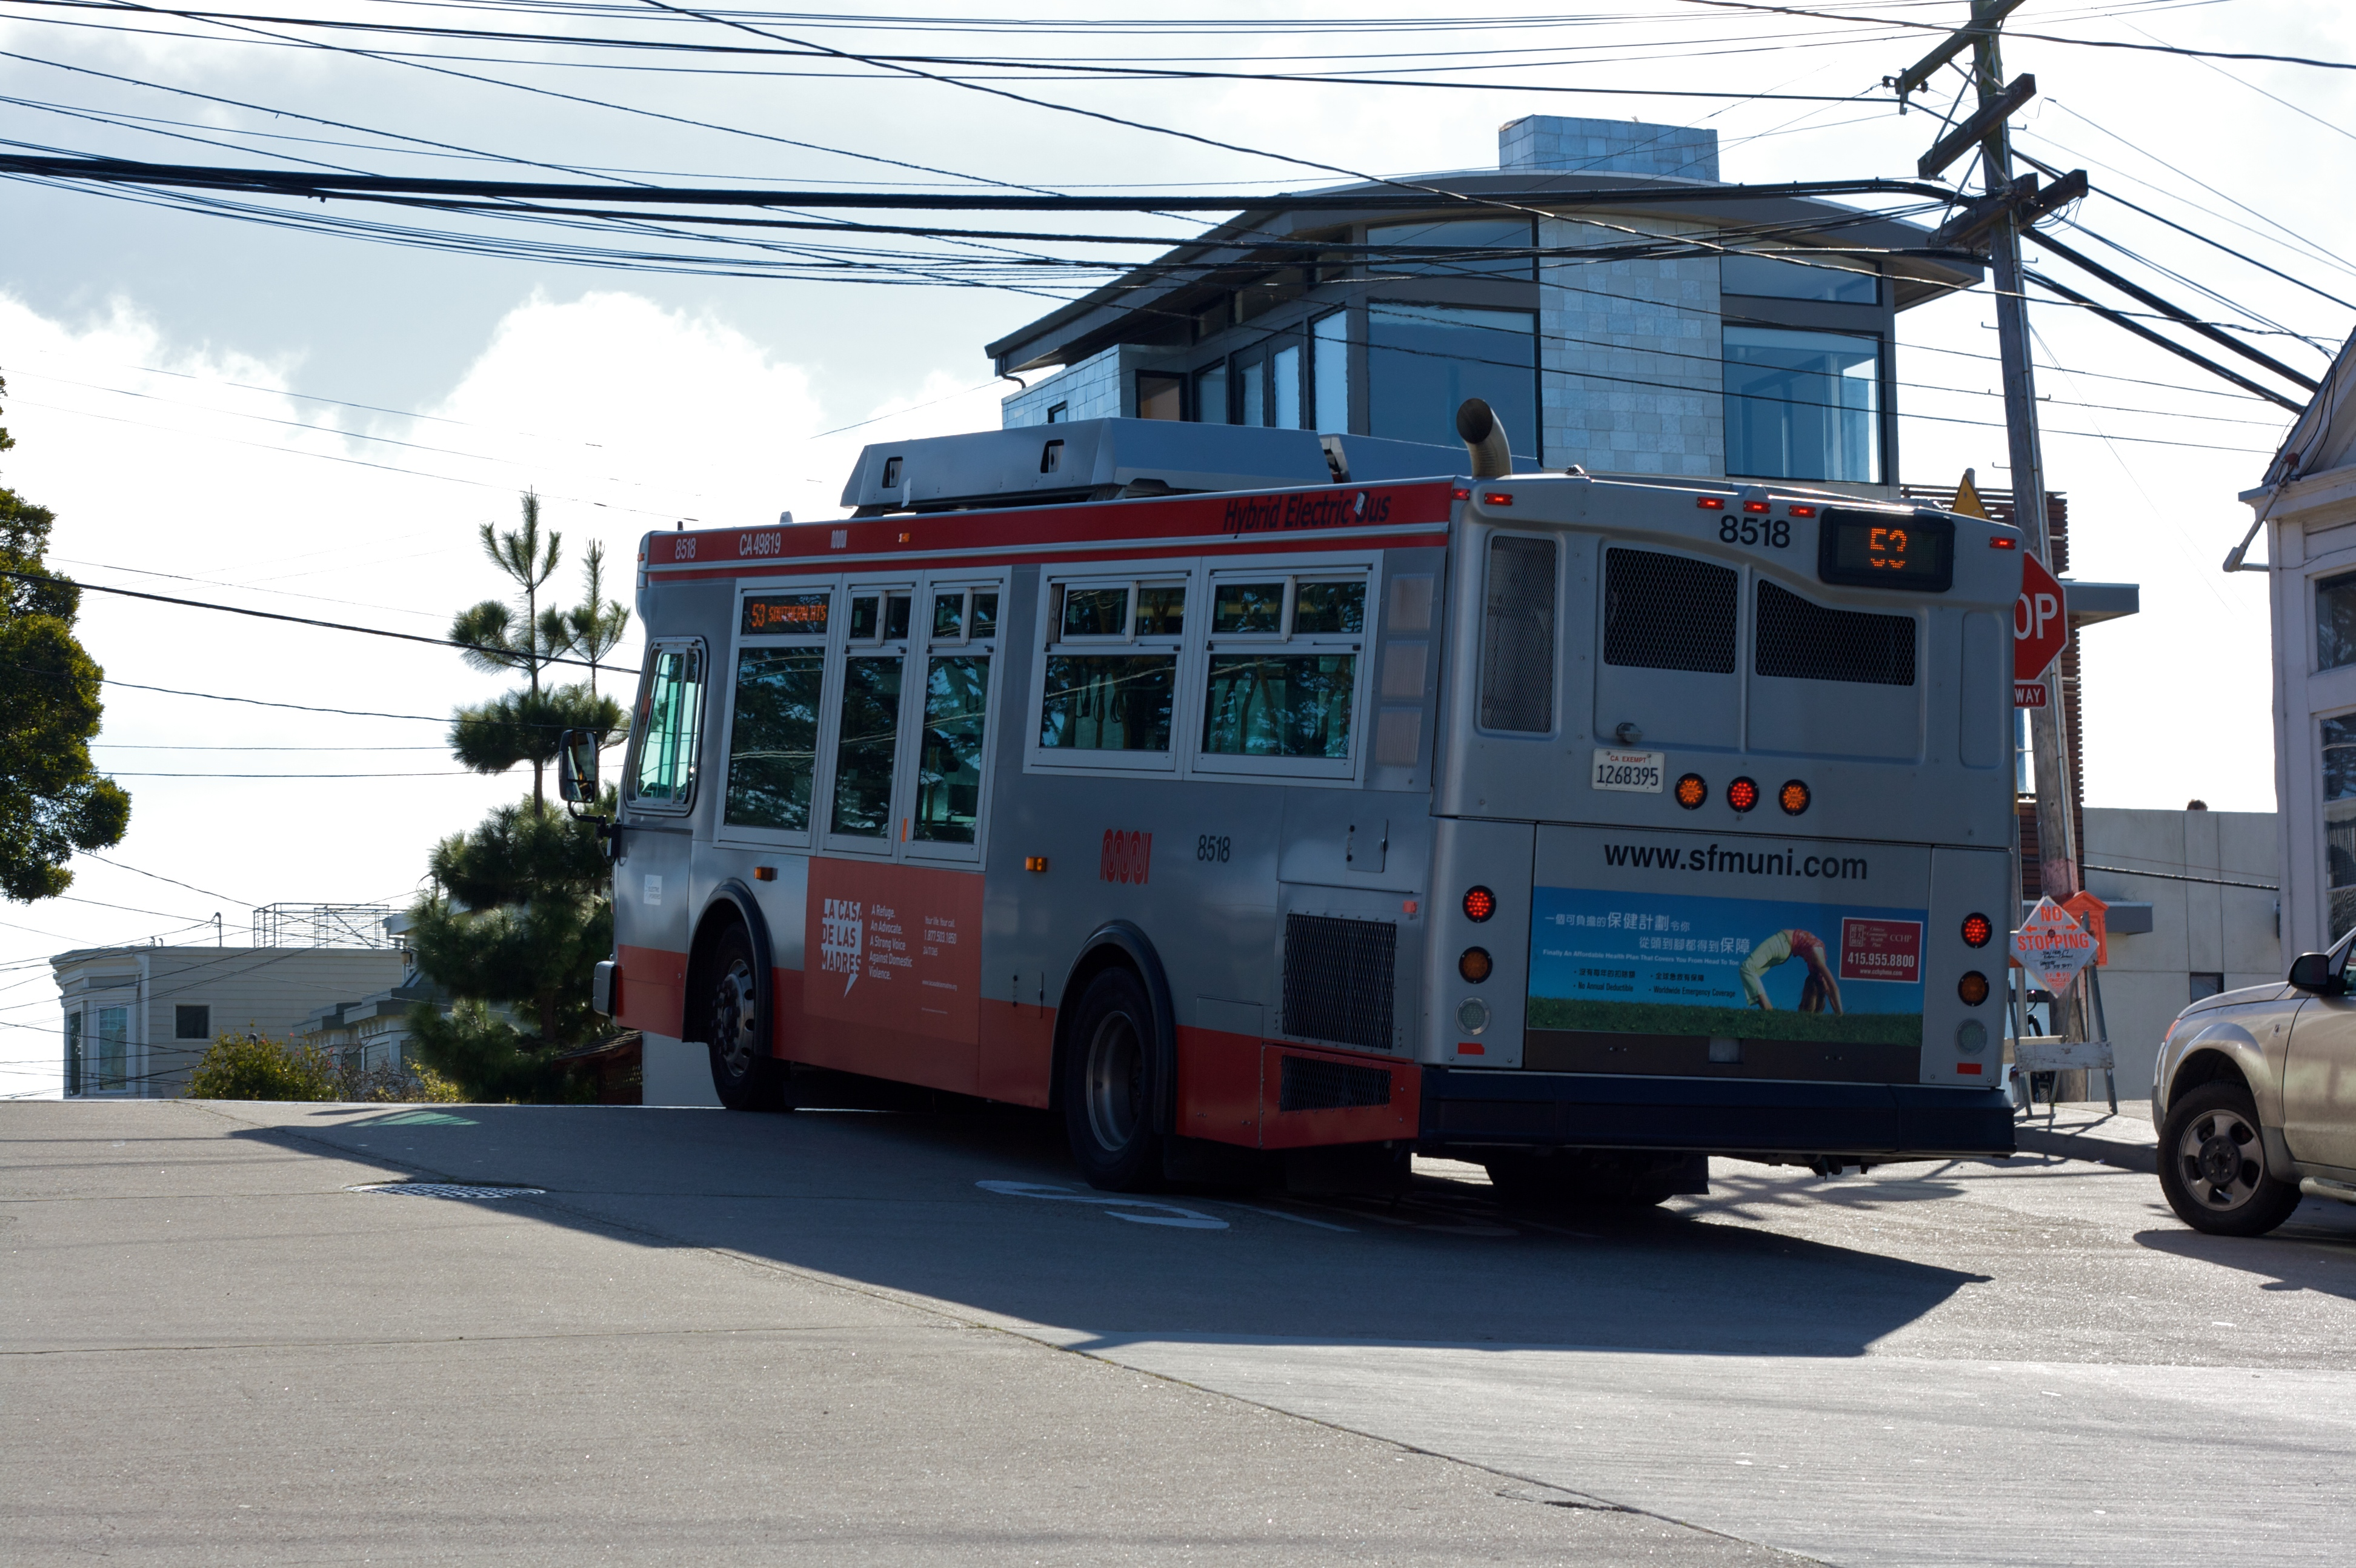 Muni Trolleys San Francisco File:san Francisco Muni Bus